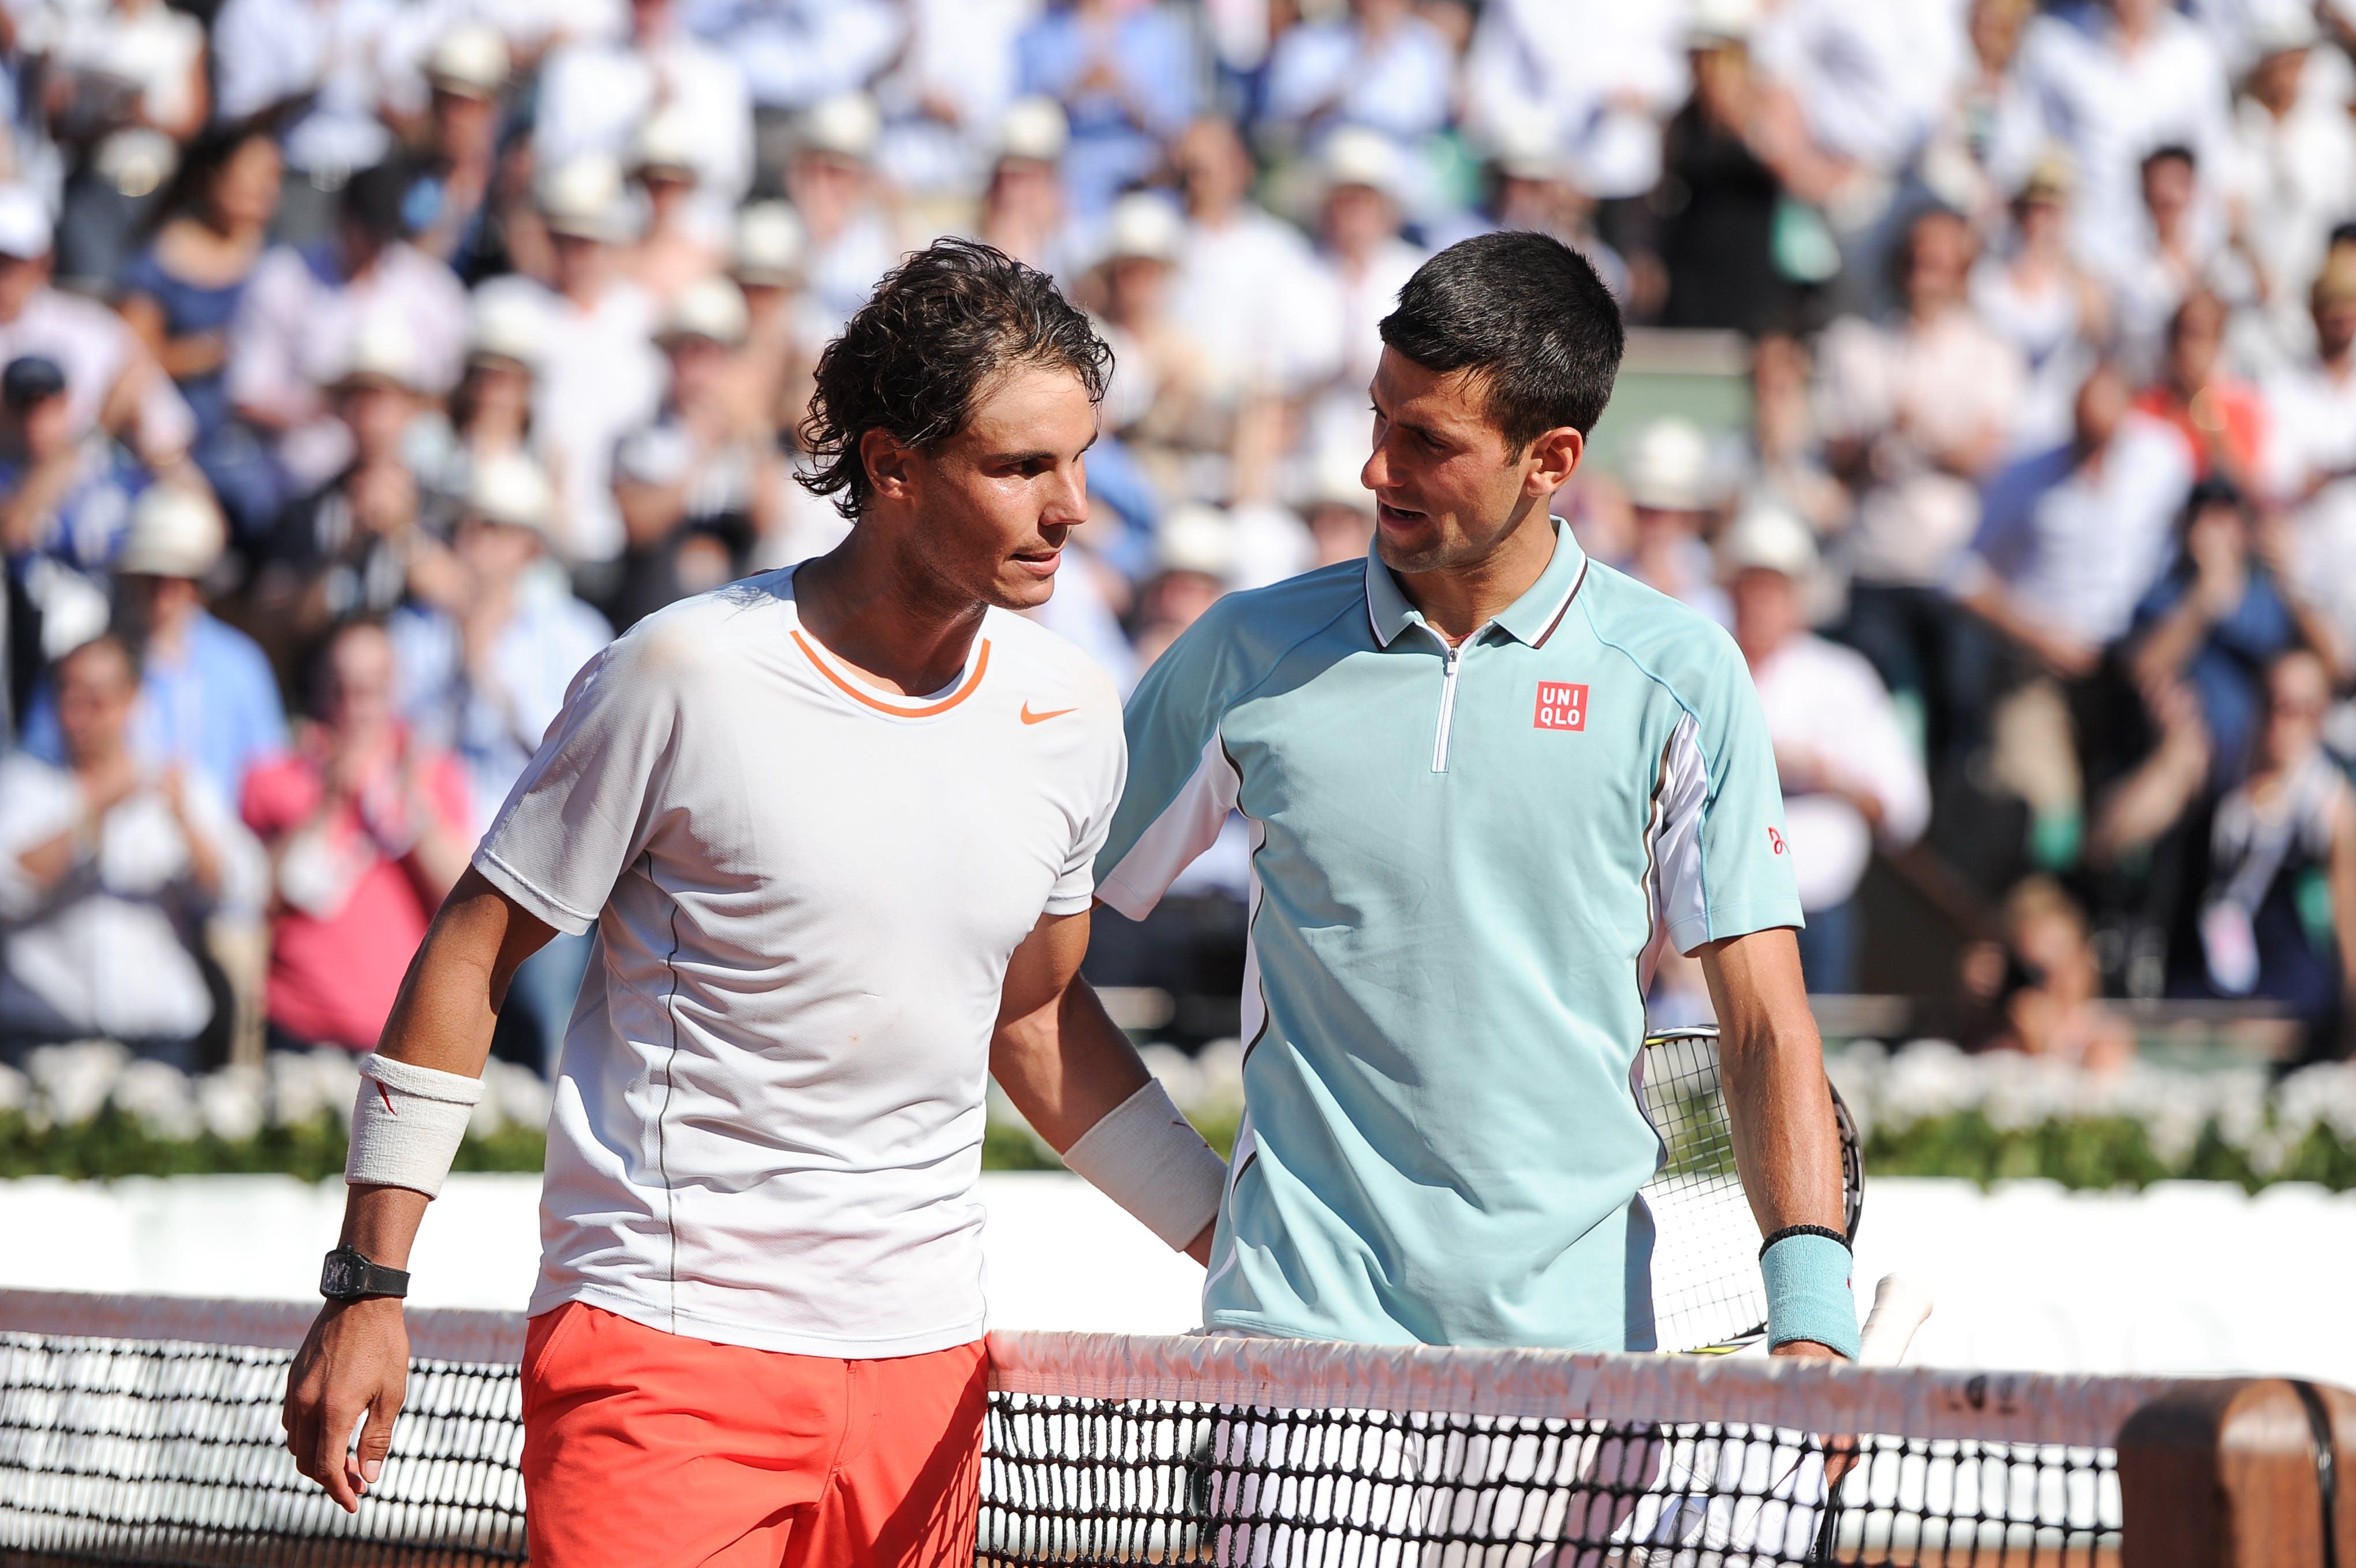 Rafael Nadal & Novak Djokovic after their semi-final at Roland-Garros 2013